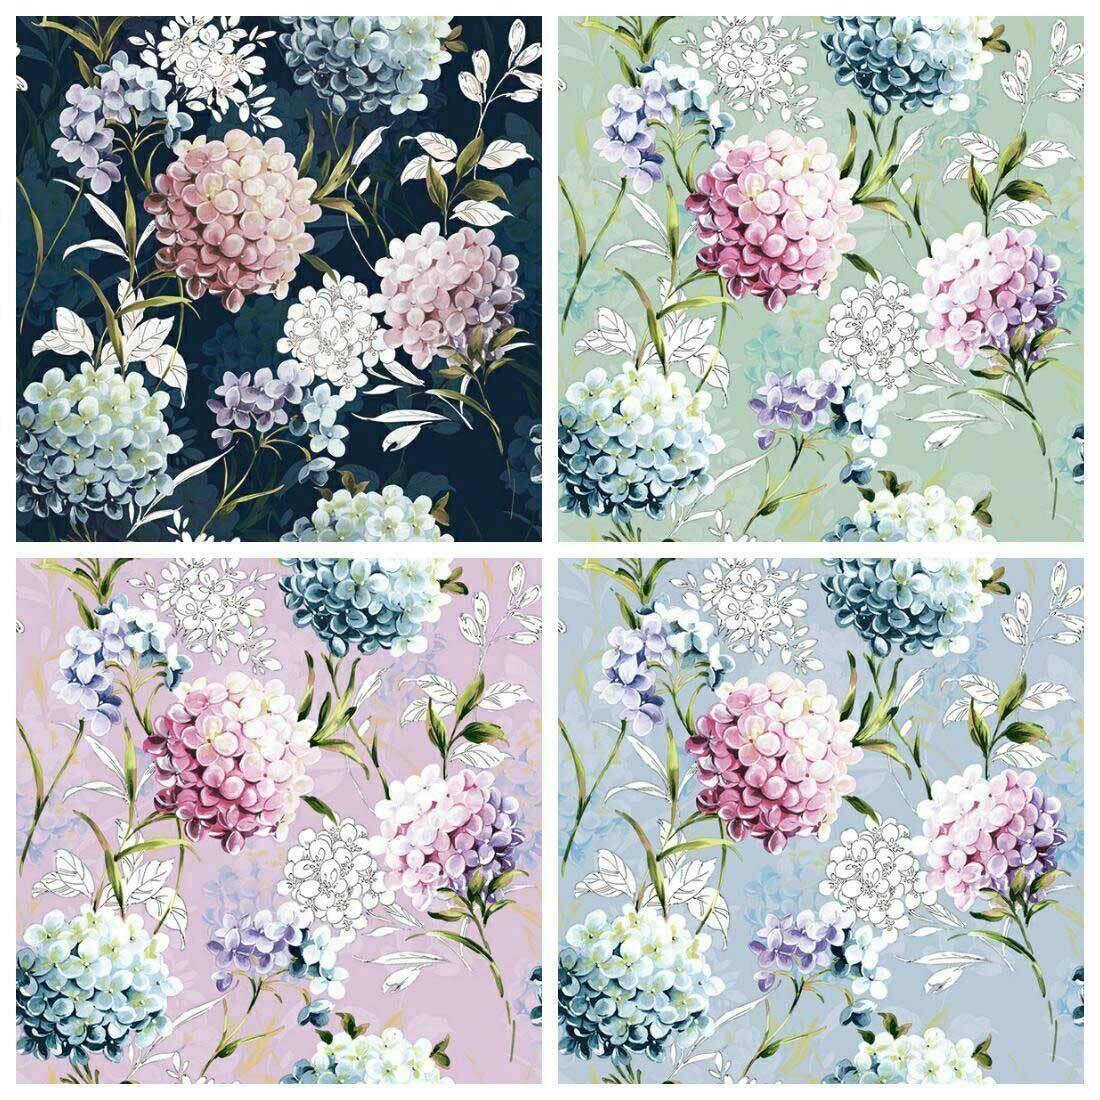 Decoupage Paper Napkins - Floral 25 - Horana's 13x13 (4 Sheets)